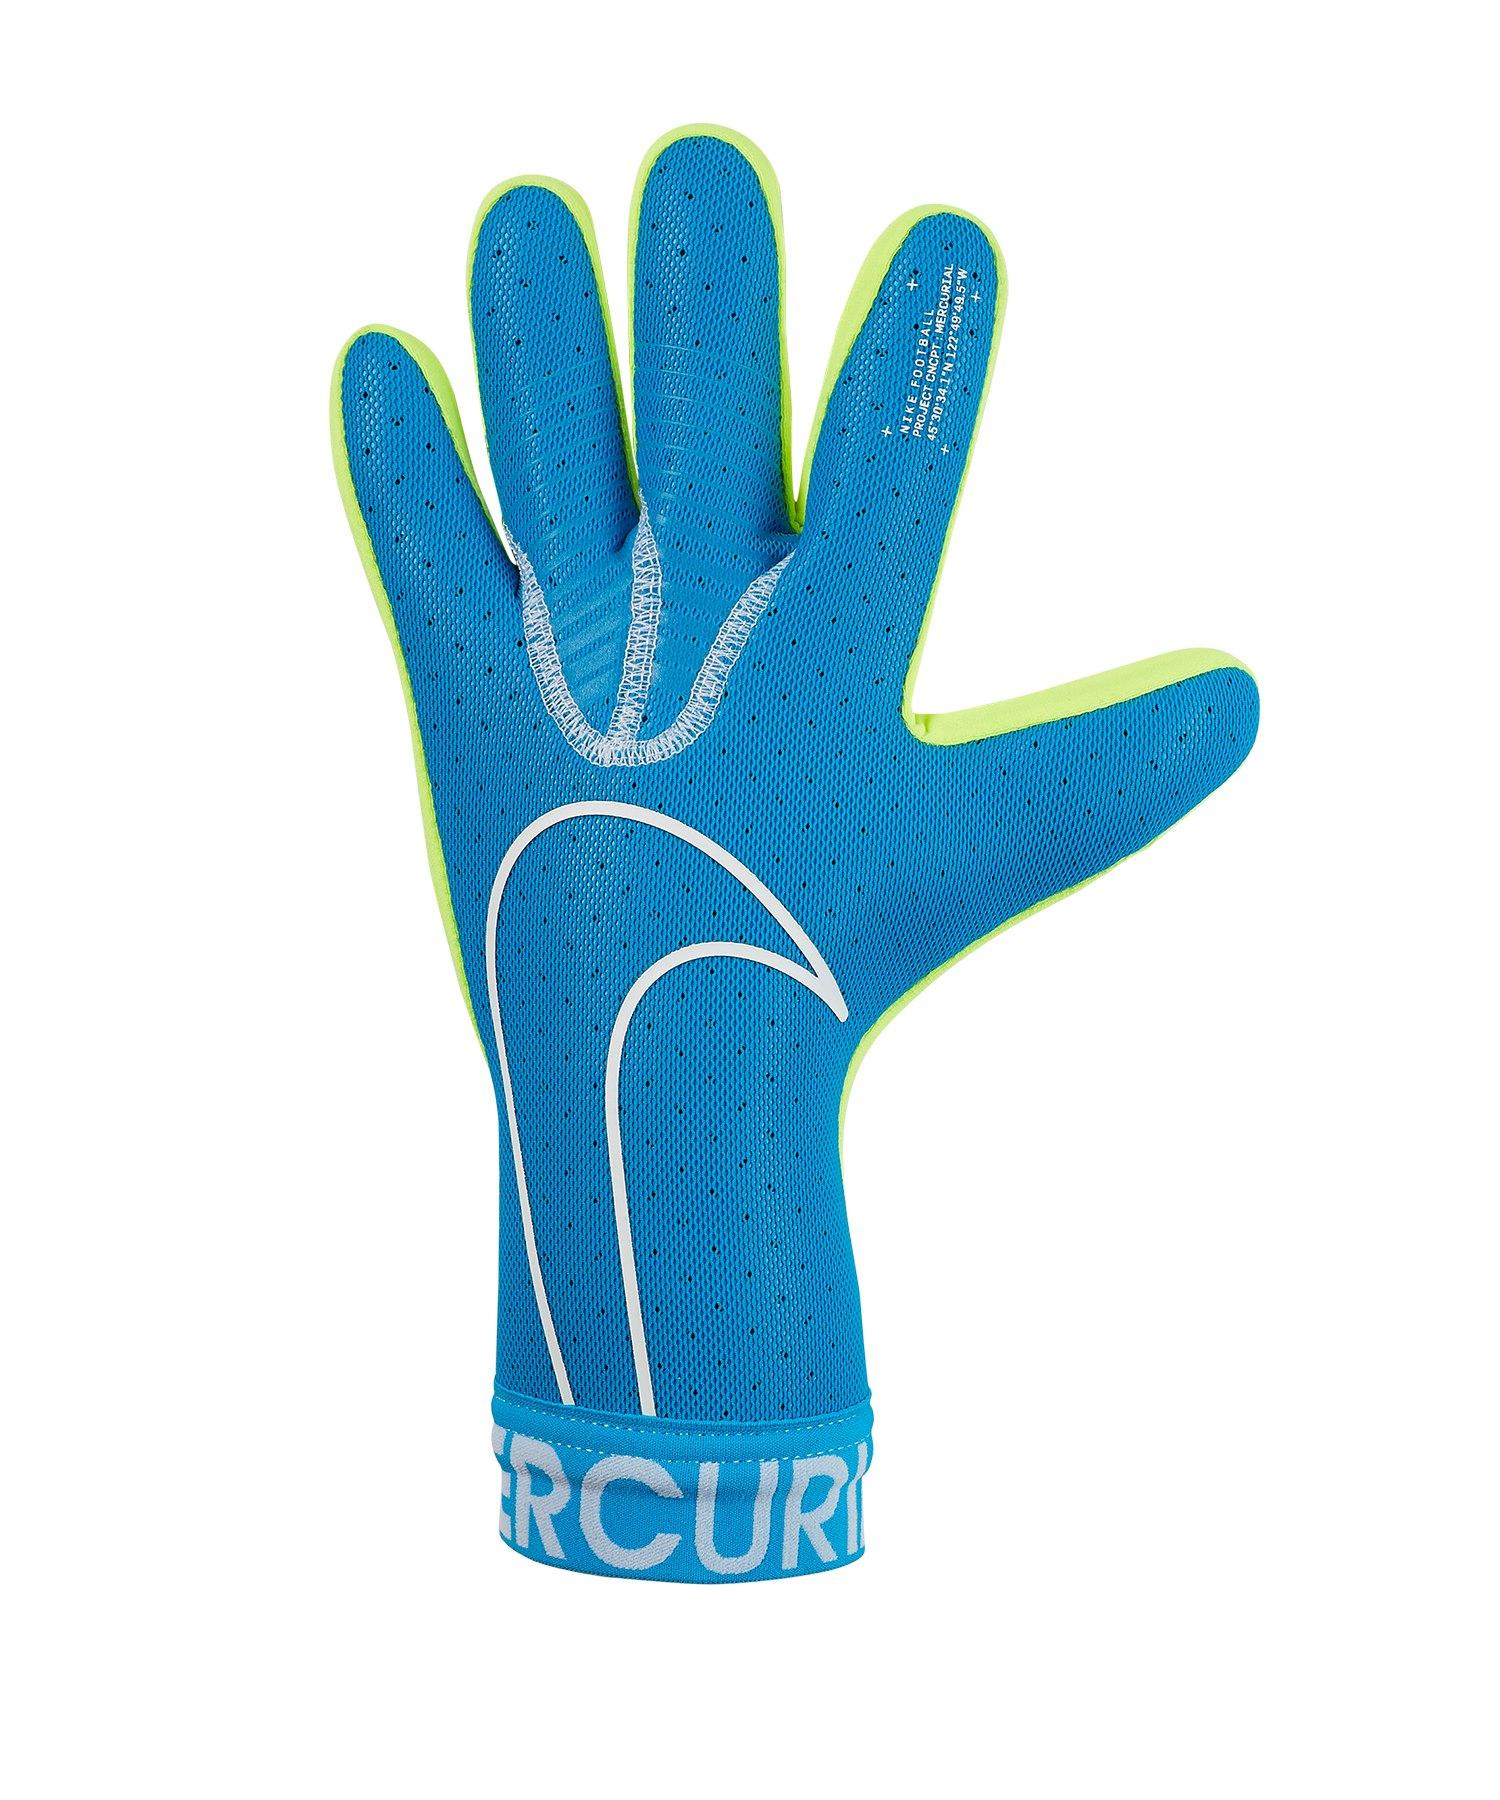 Nike Mercurial Touch Elite TW-Handschuh Blau F486 - blau